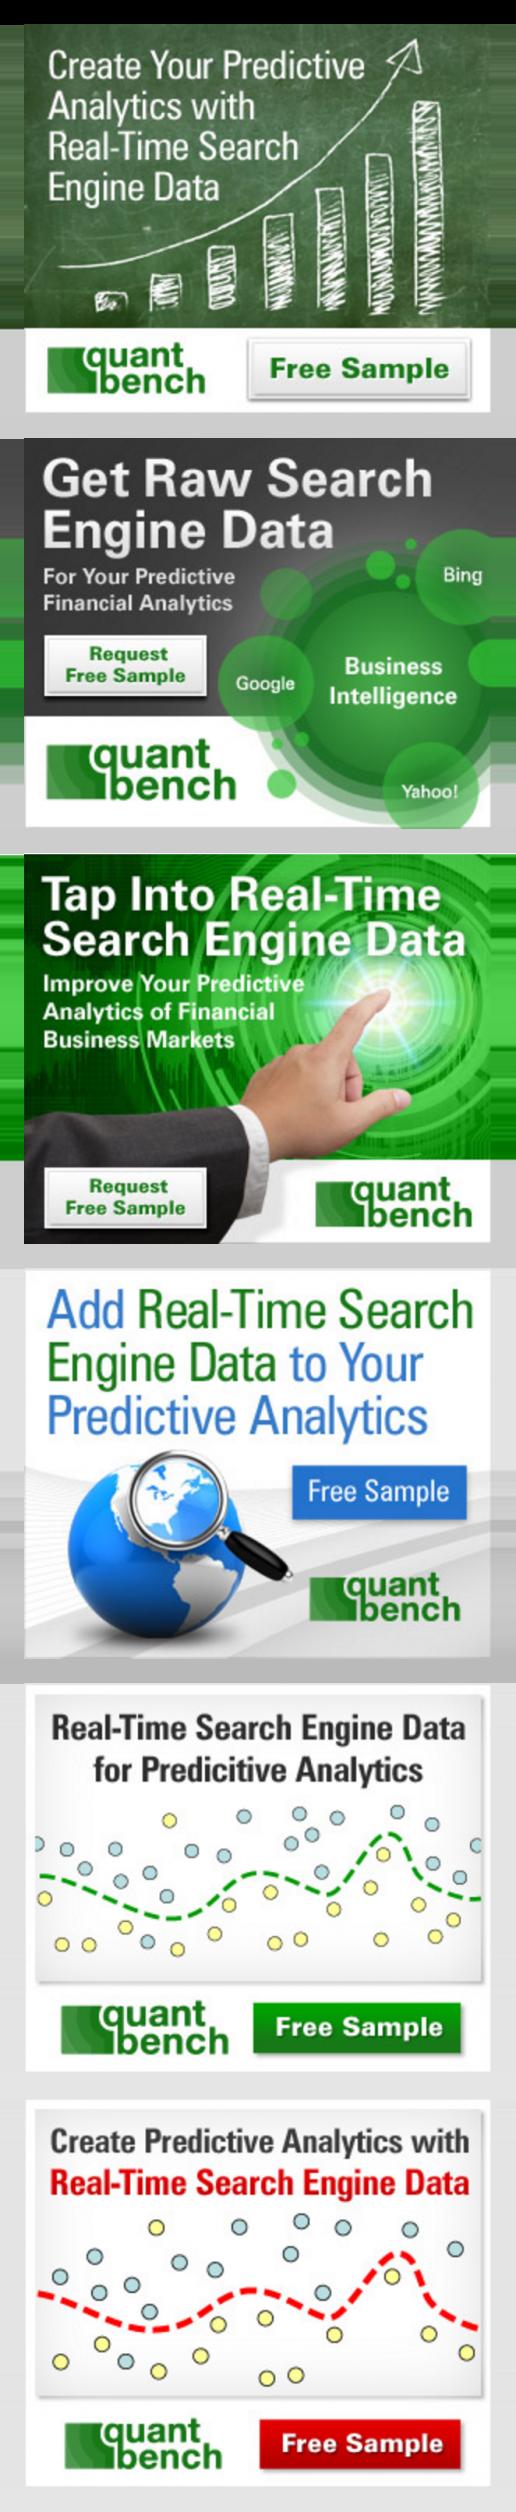 quantbench-predictive-analytics-banner-ad-previews